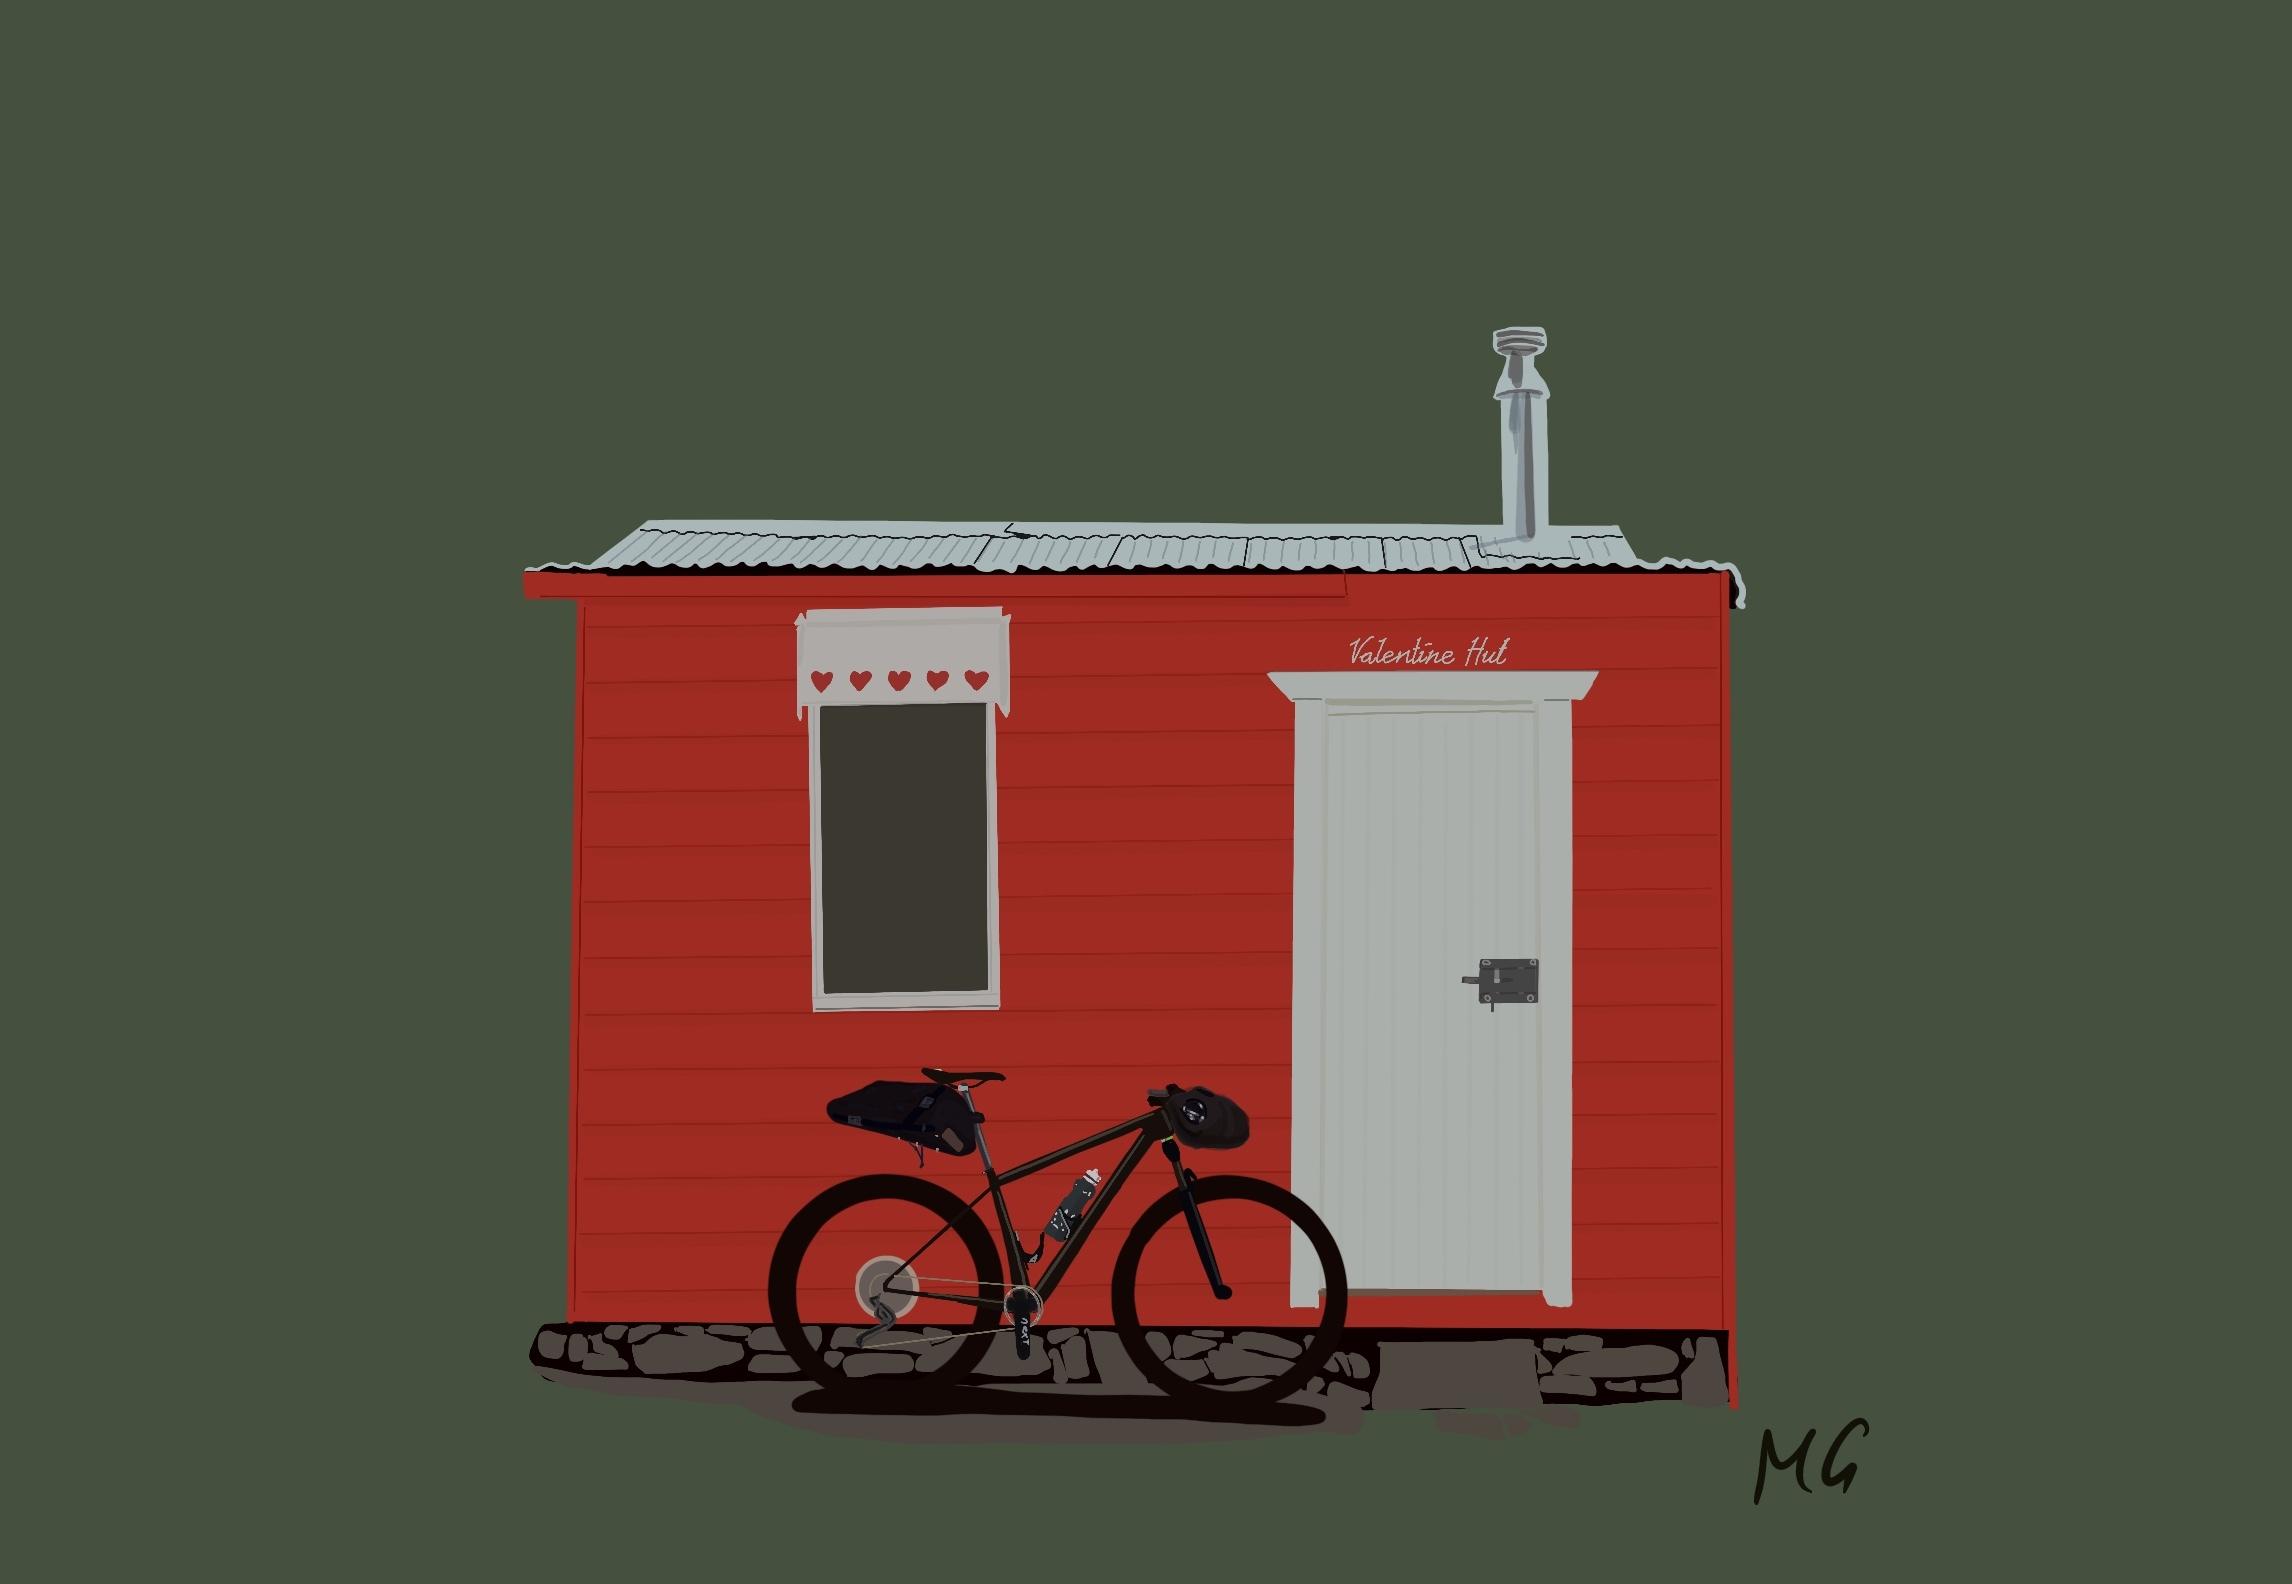 Drawing of Valentine Hut in Kosciuszko National Park @Mattiedrawsbikes Mattie draws bikes bikepacking illustrations using procreate